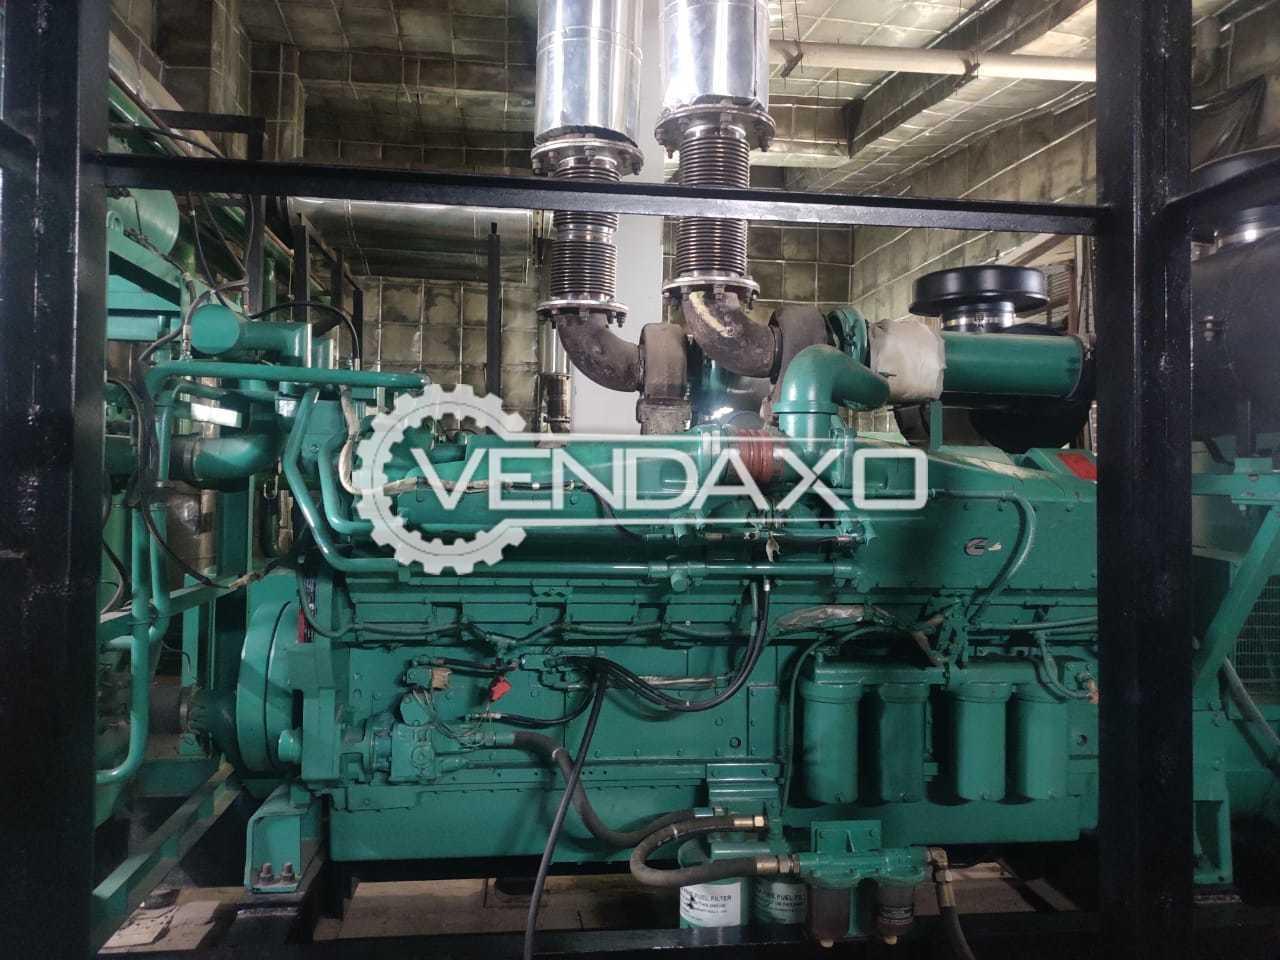 Cummins Sudhir Diesel Generator - 1250 Kva, 2013 Model